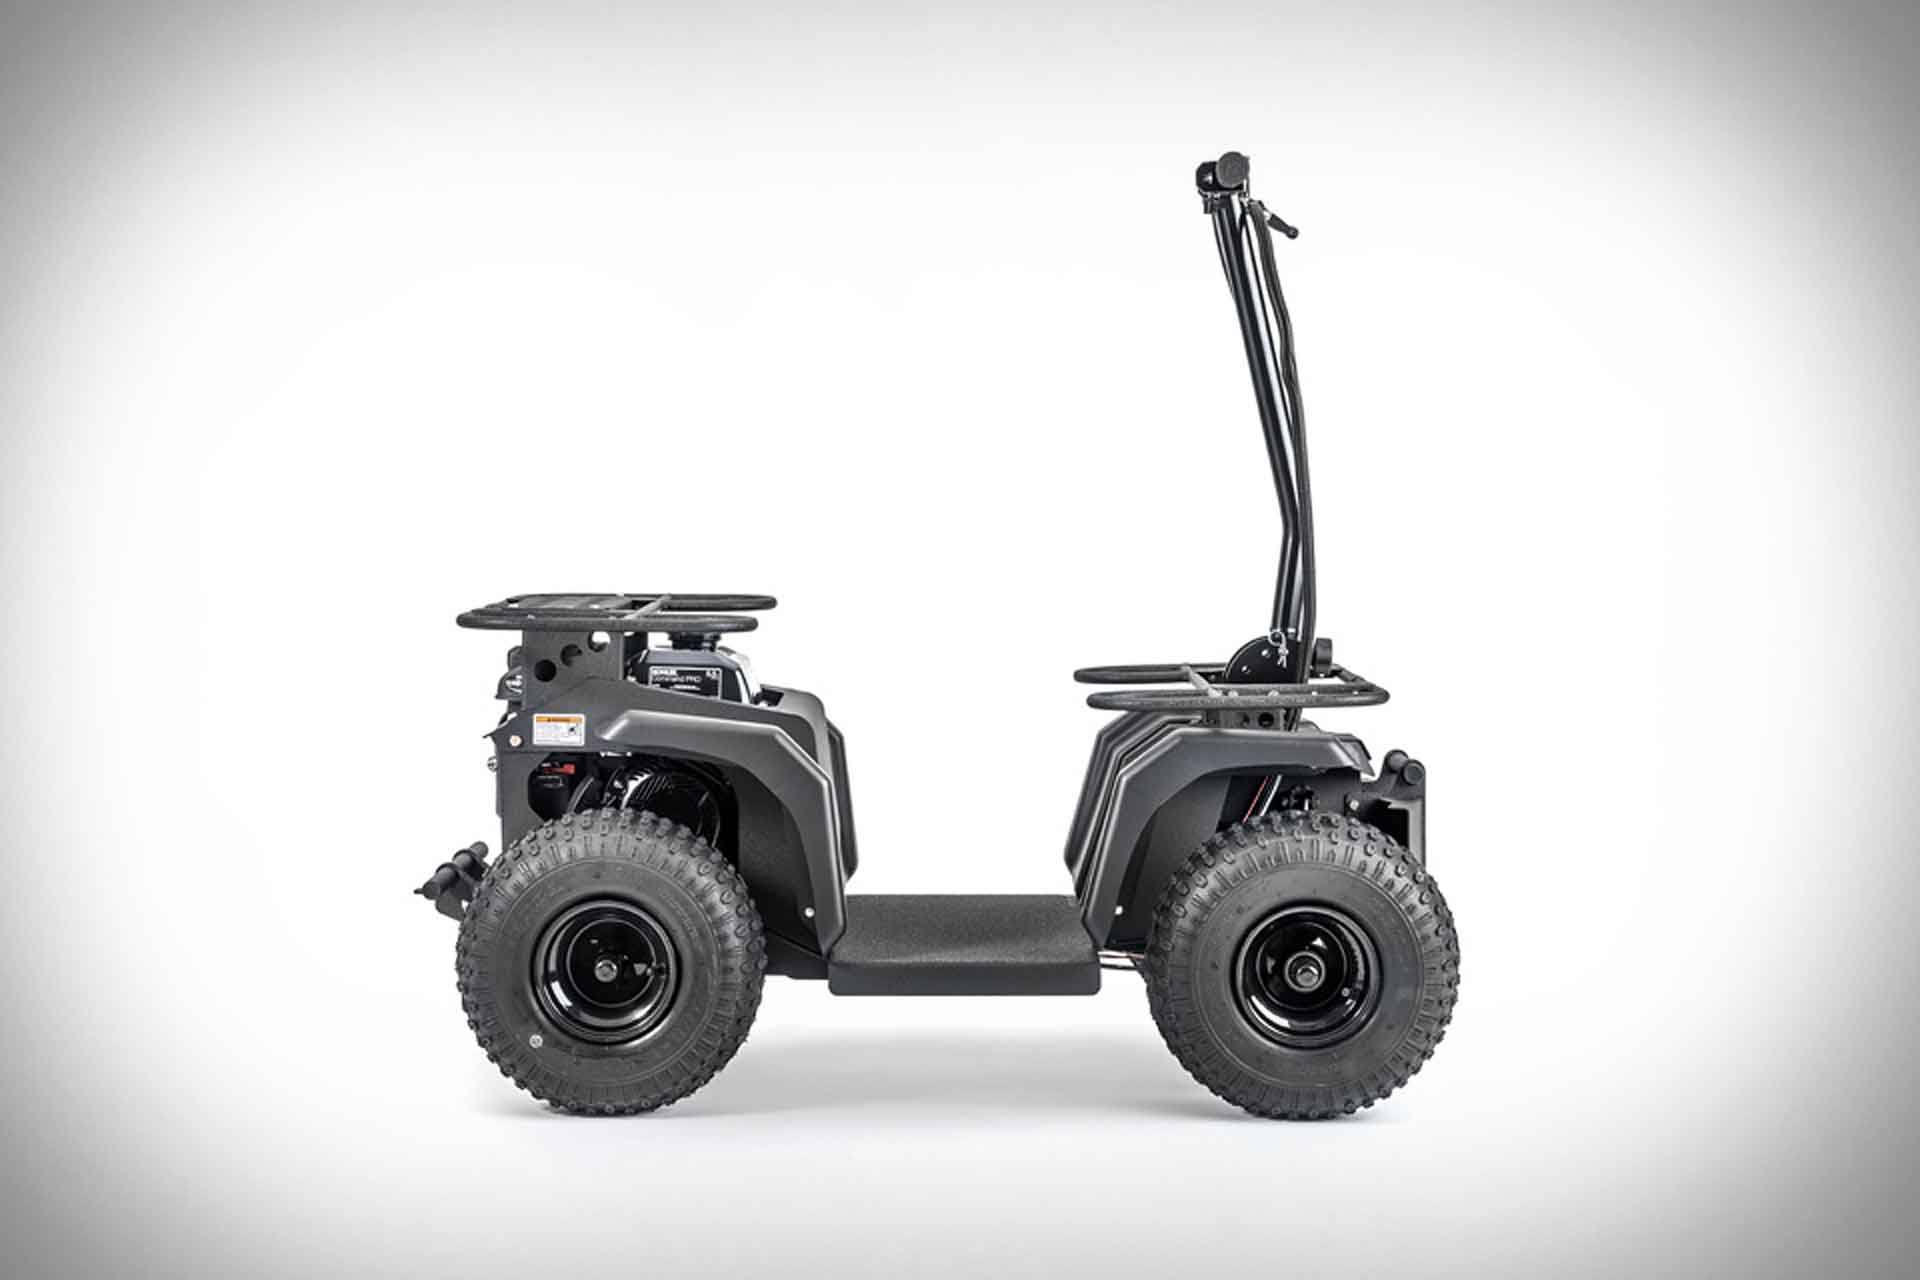 Ripper ATV Scooter